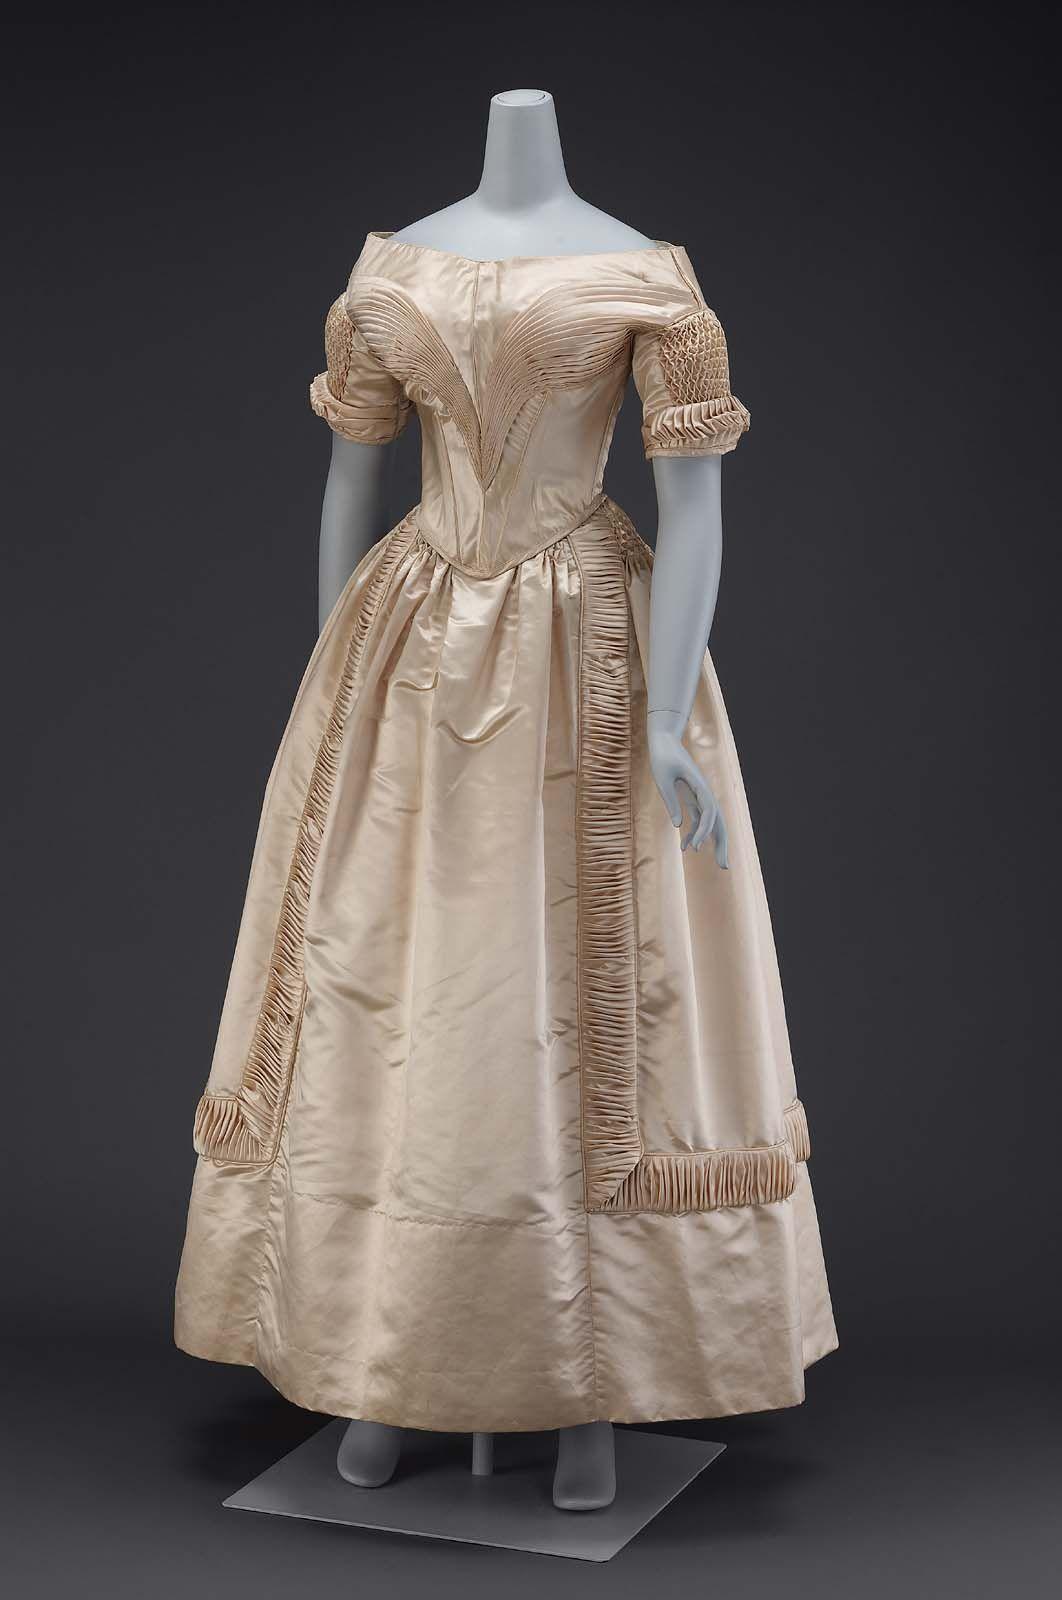 1840, America - Wedding dress - Silk satin, cotton lining, whalebone, metal hook & eye closures